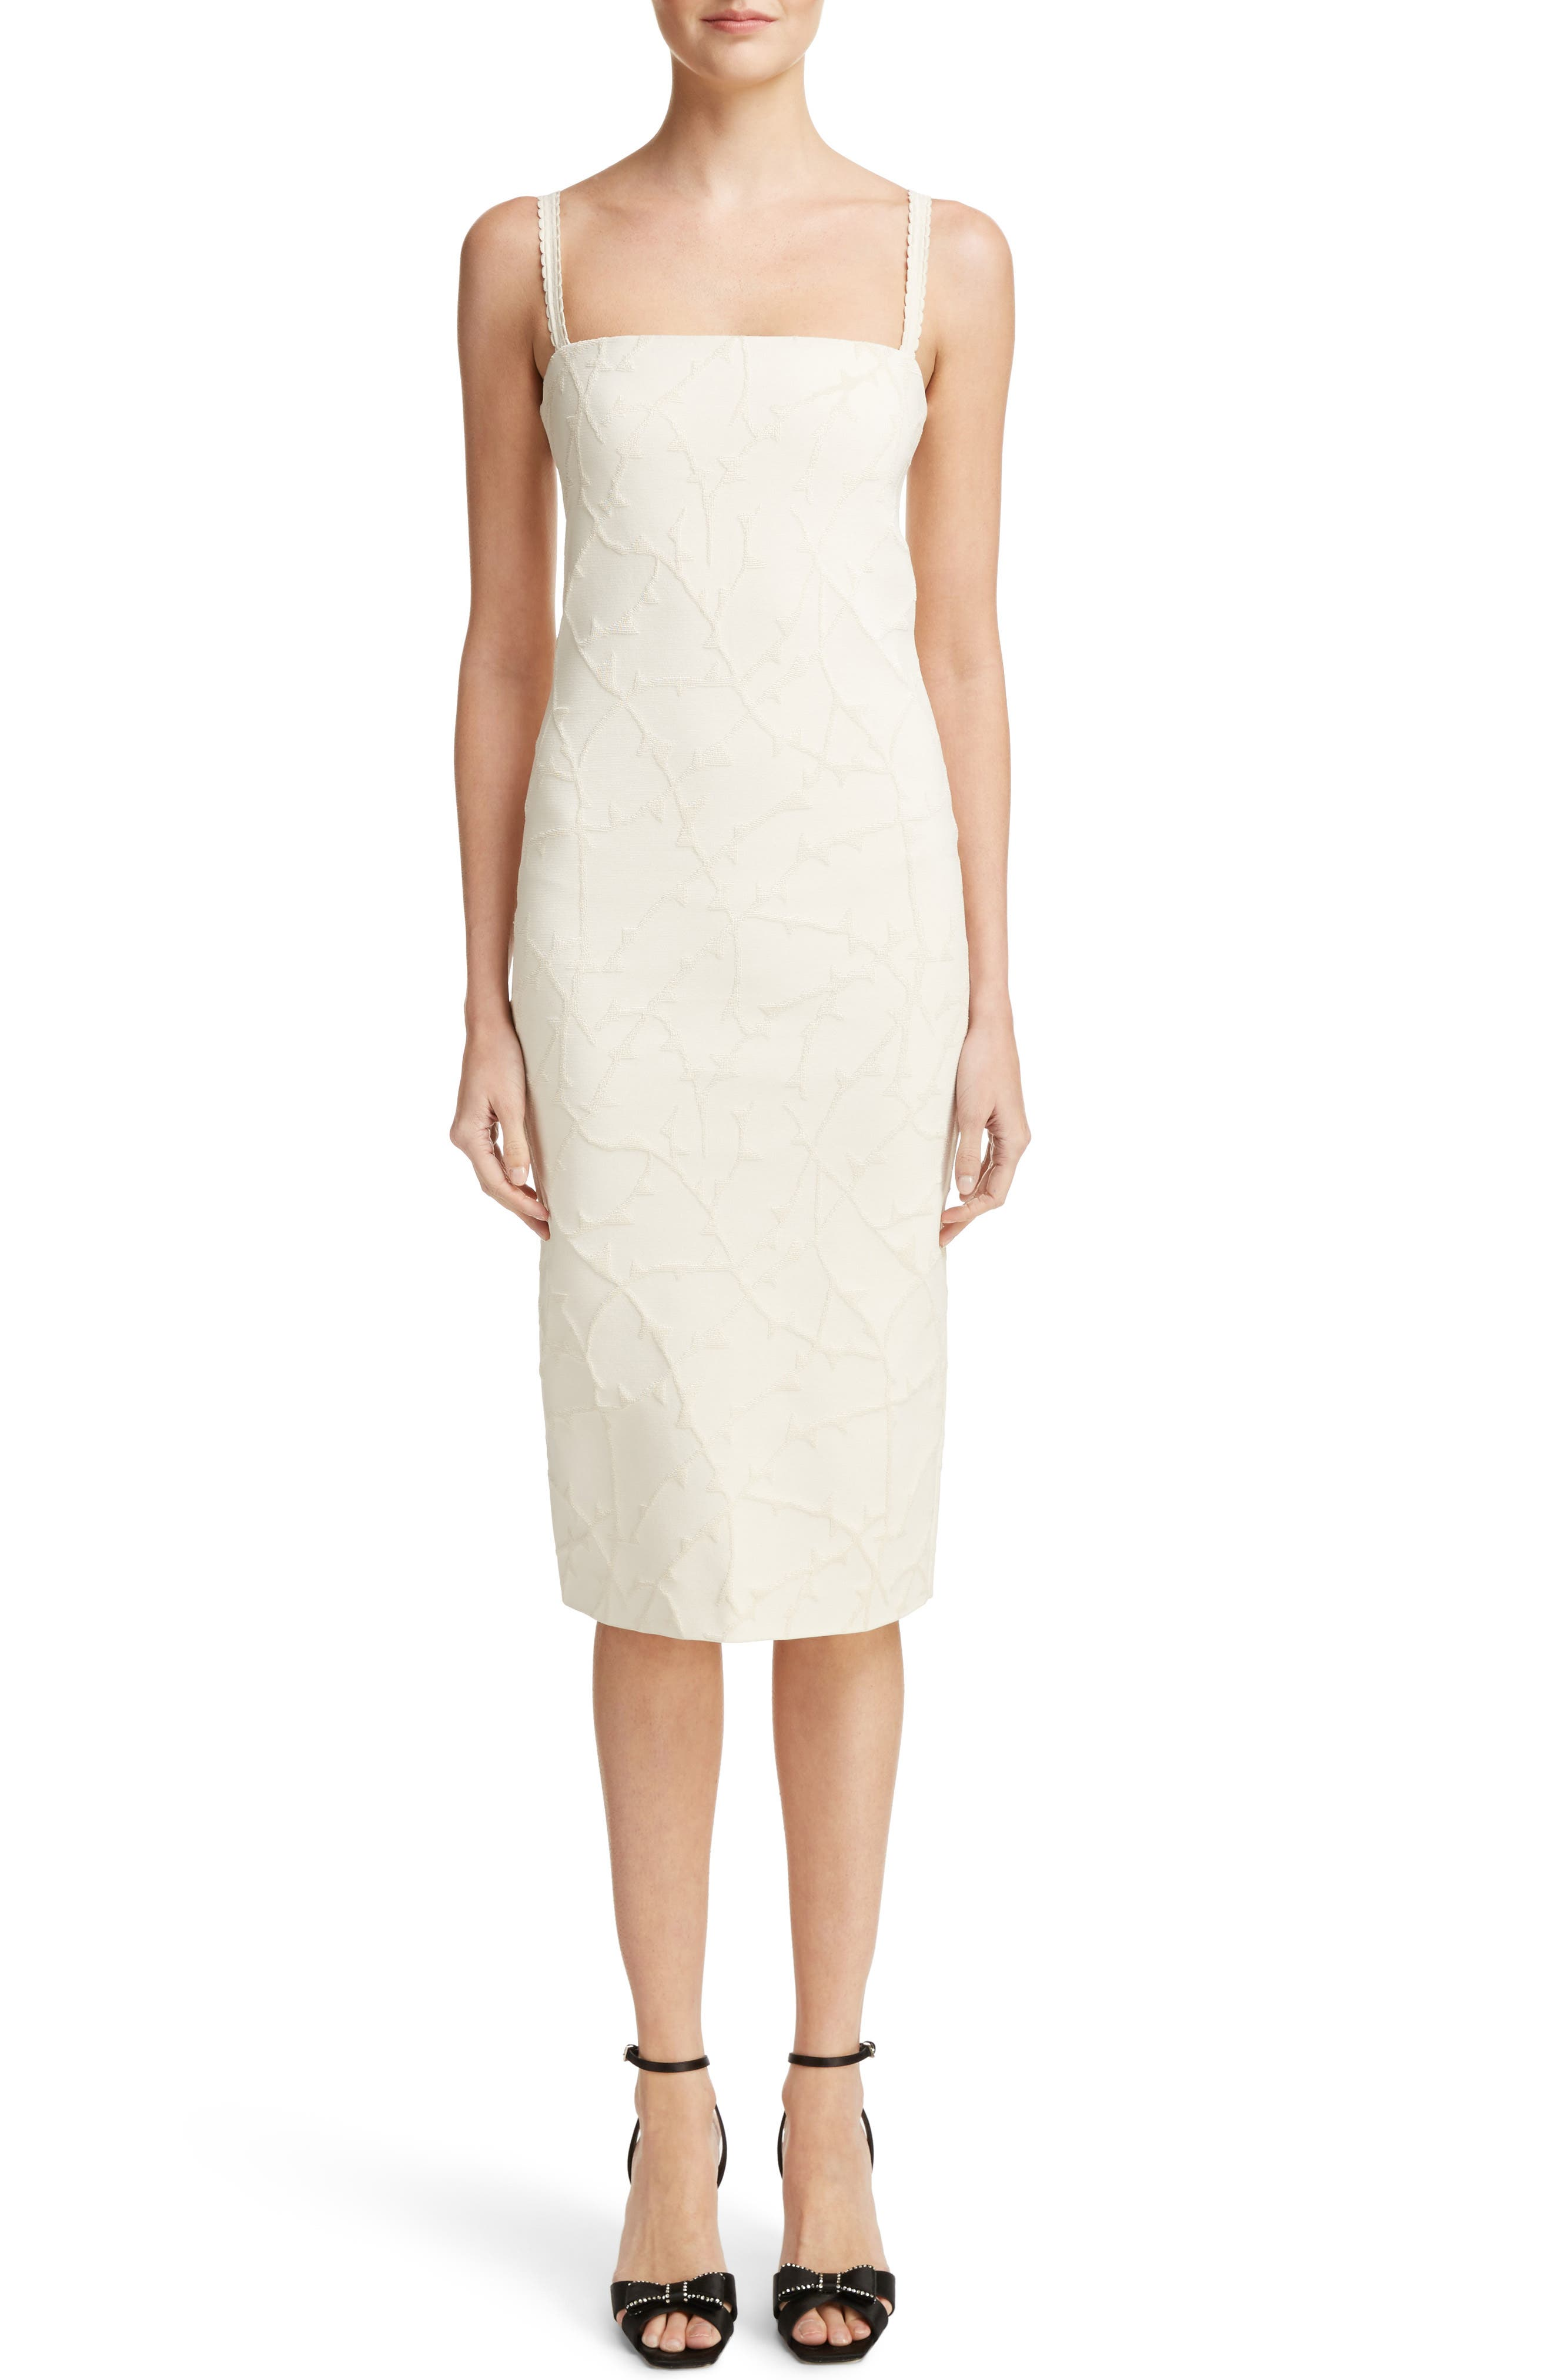 Alternate Image 1 Selected - Loewe Jacquard Knit Dress